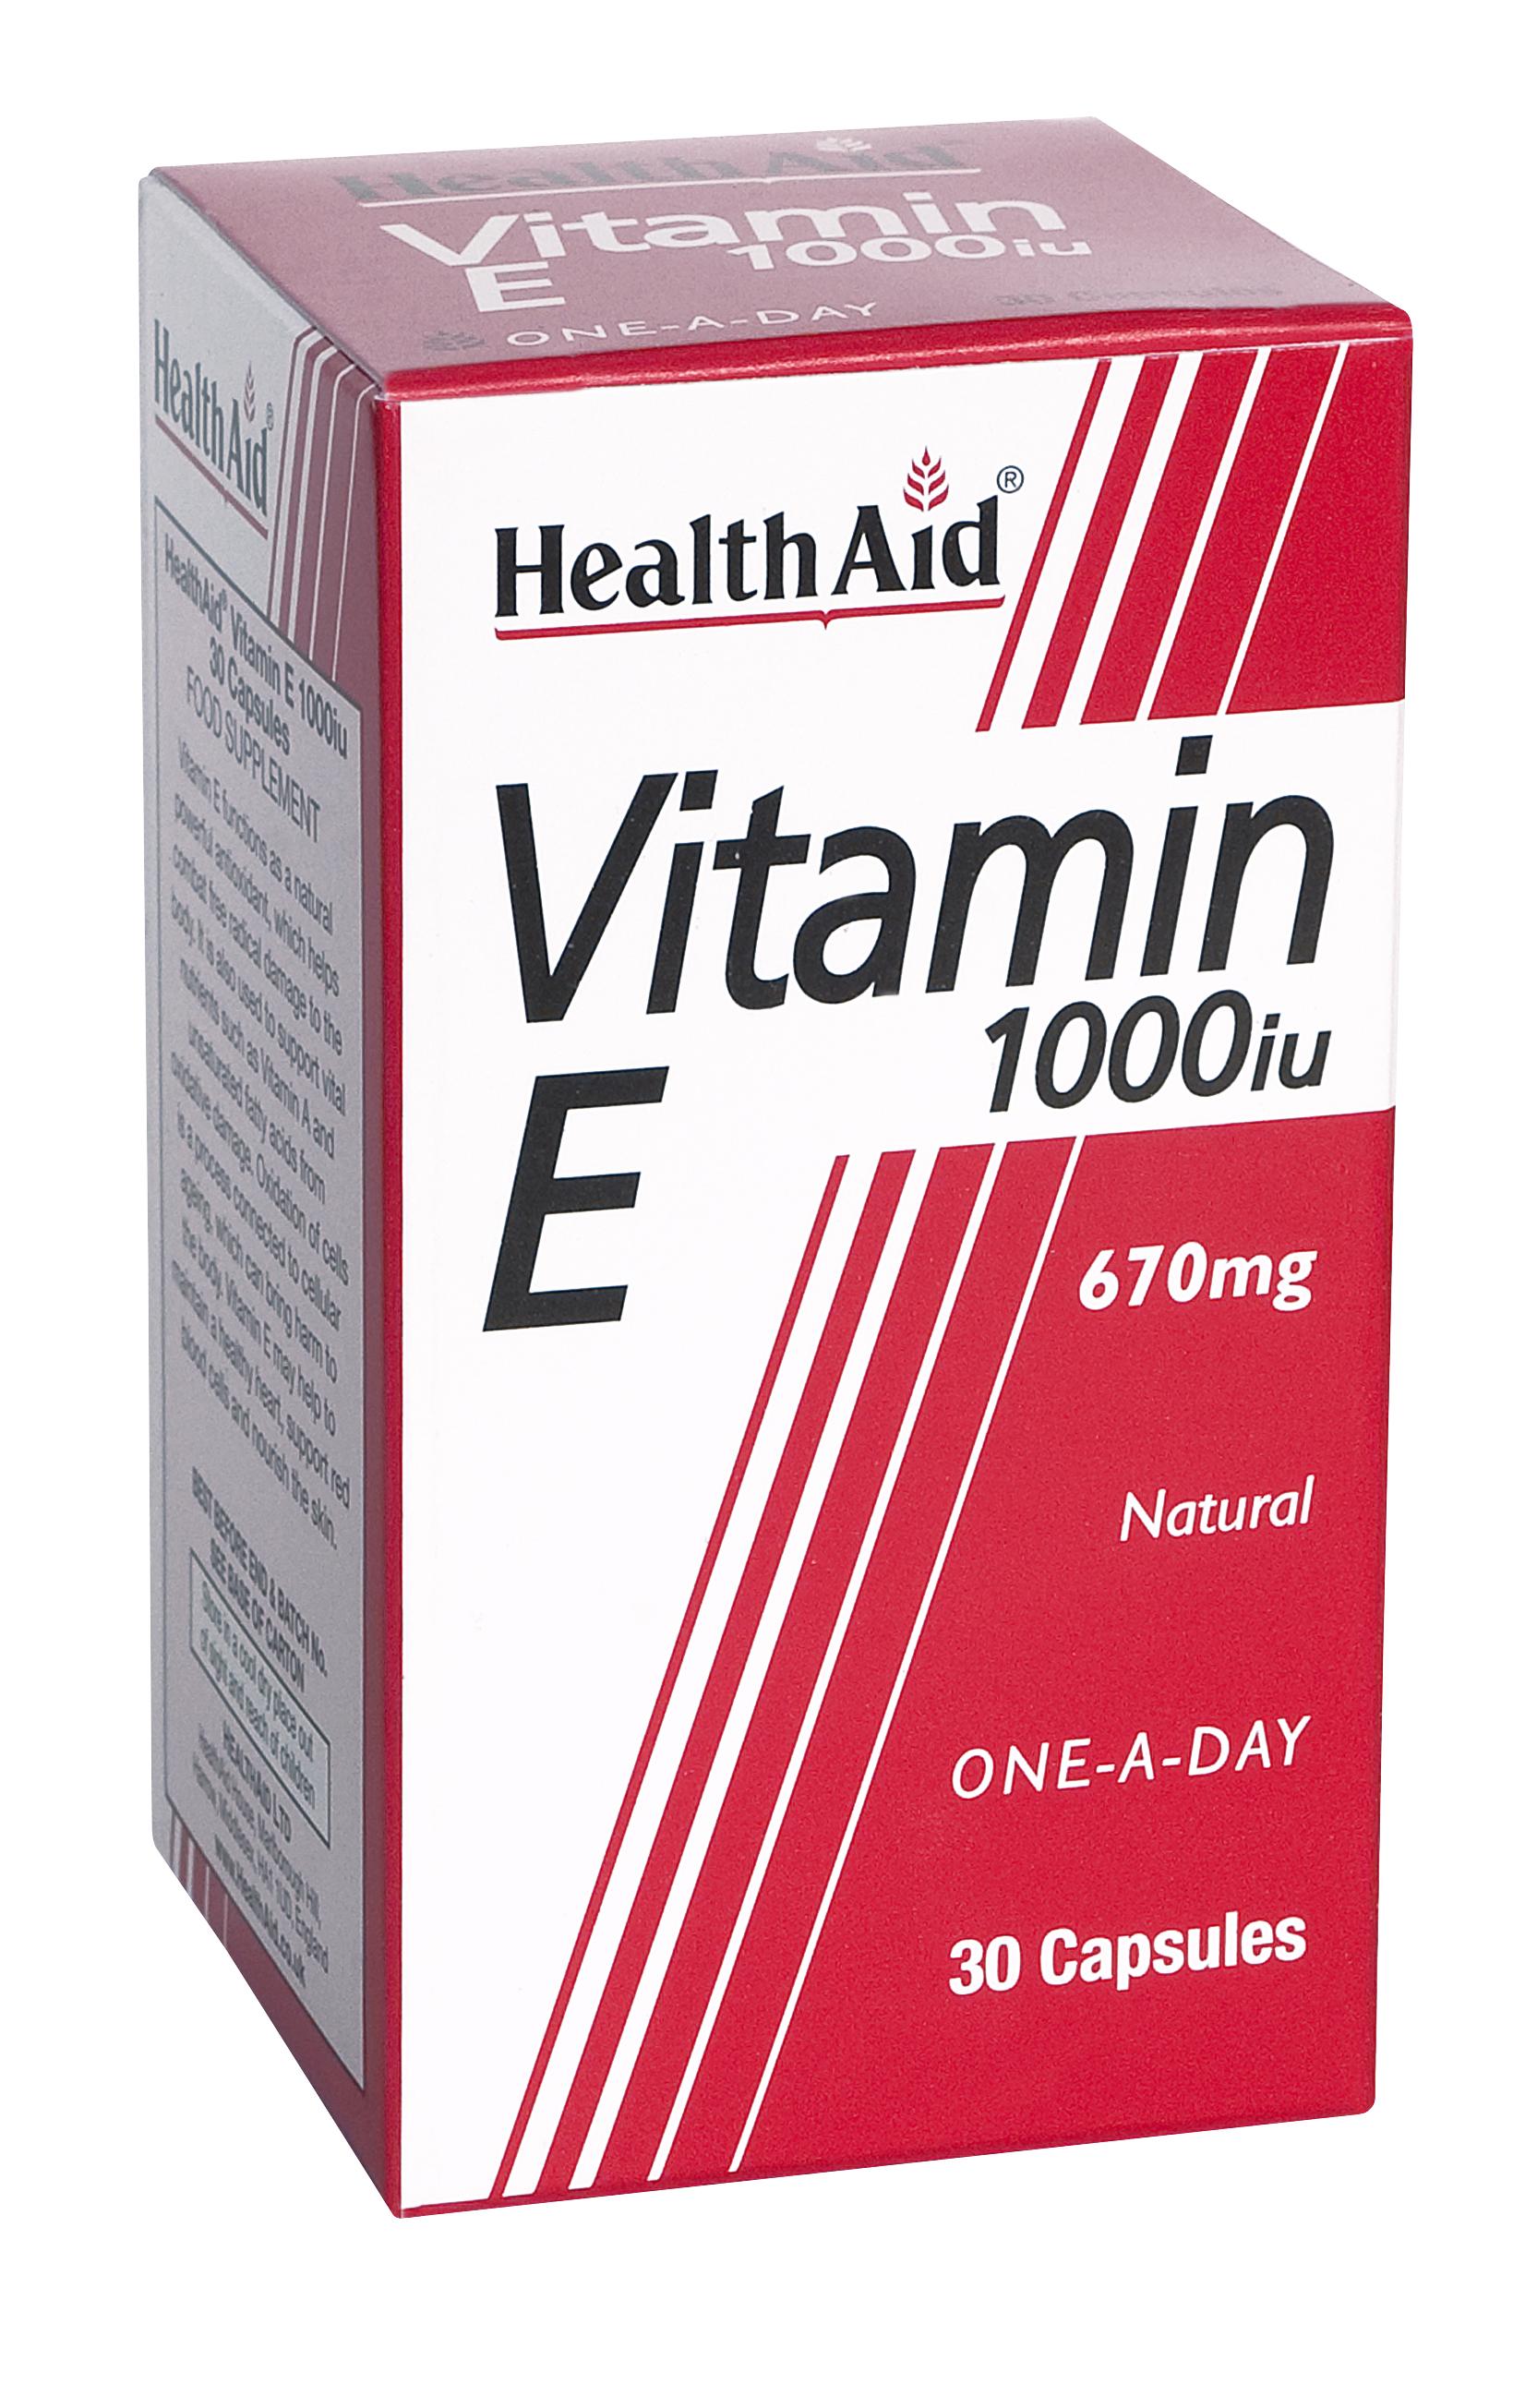 Health Aid Vitamin E 1000Iu Ενεργό Αντιοξειδωτικό 30tabs